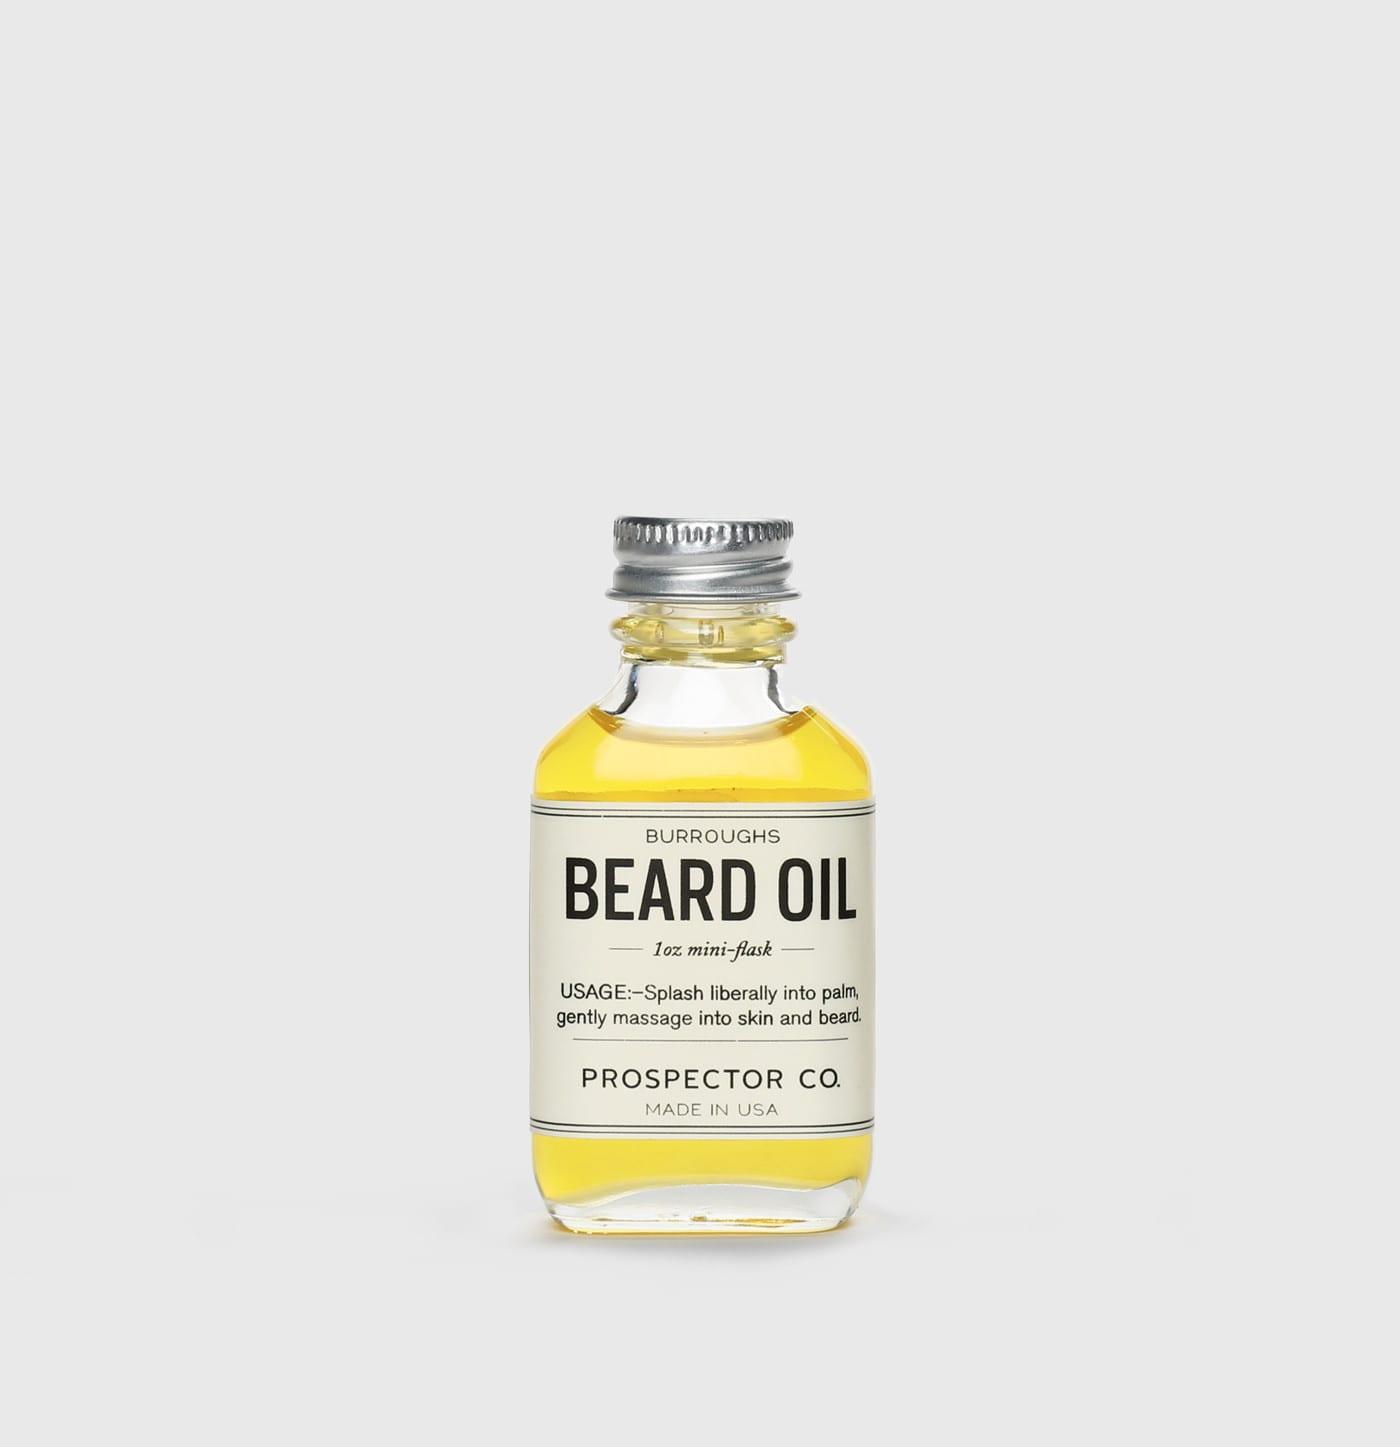 burroughts-beard-oil